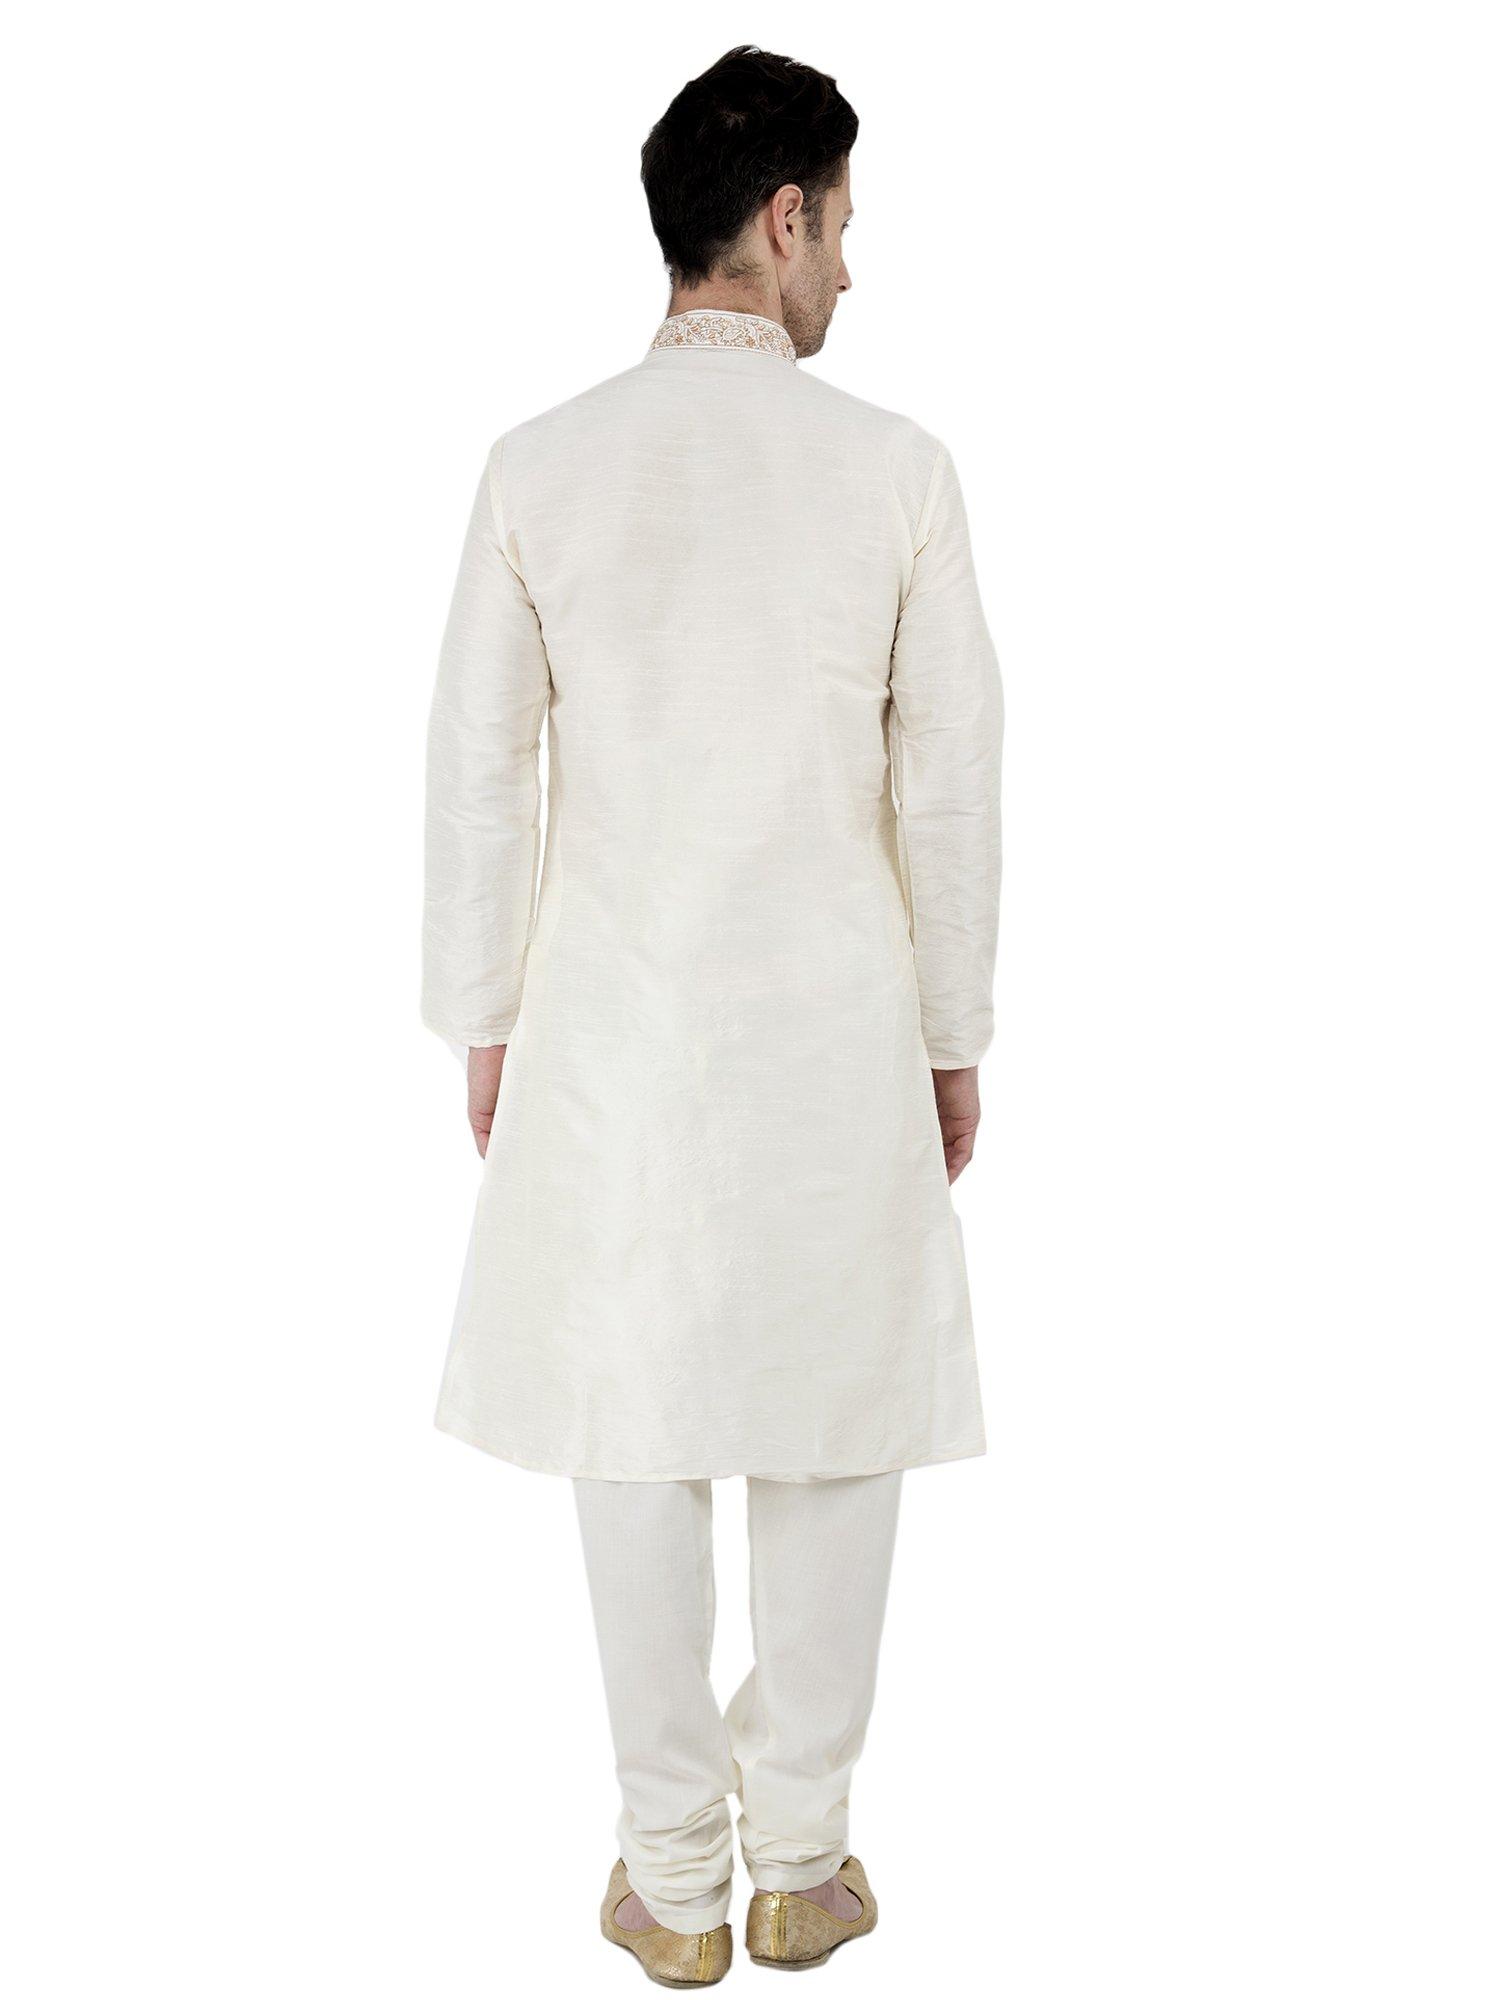 Long Sleeve Button Down Shirt Mens Kurta Pajamas Set Handmade Traditional Indian Costume Offwhite -M by SKAVIJ (Image #4)